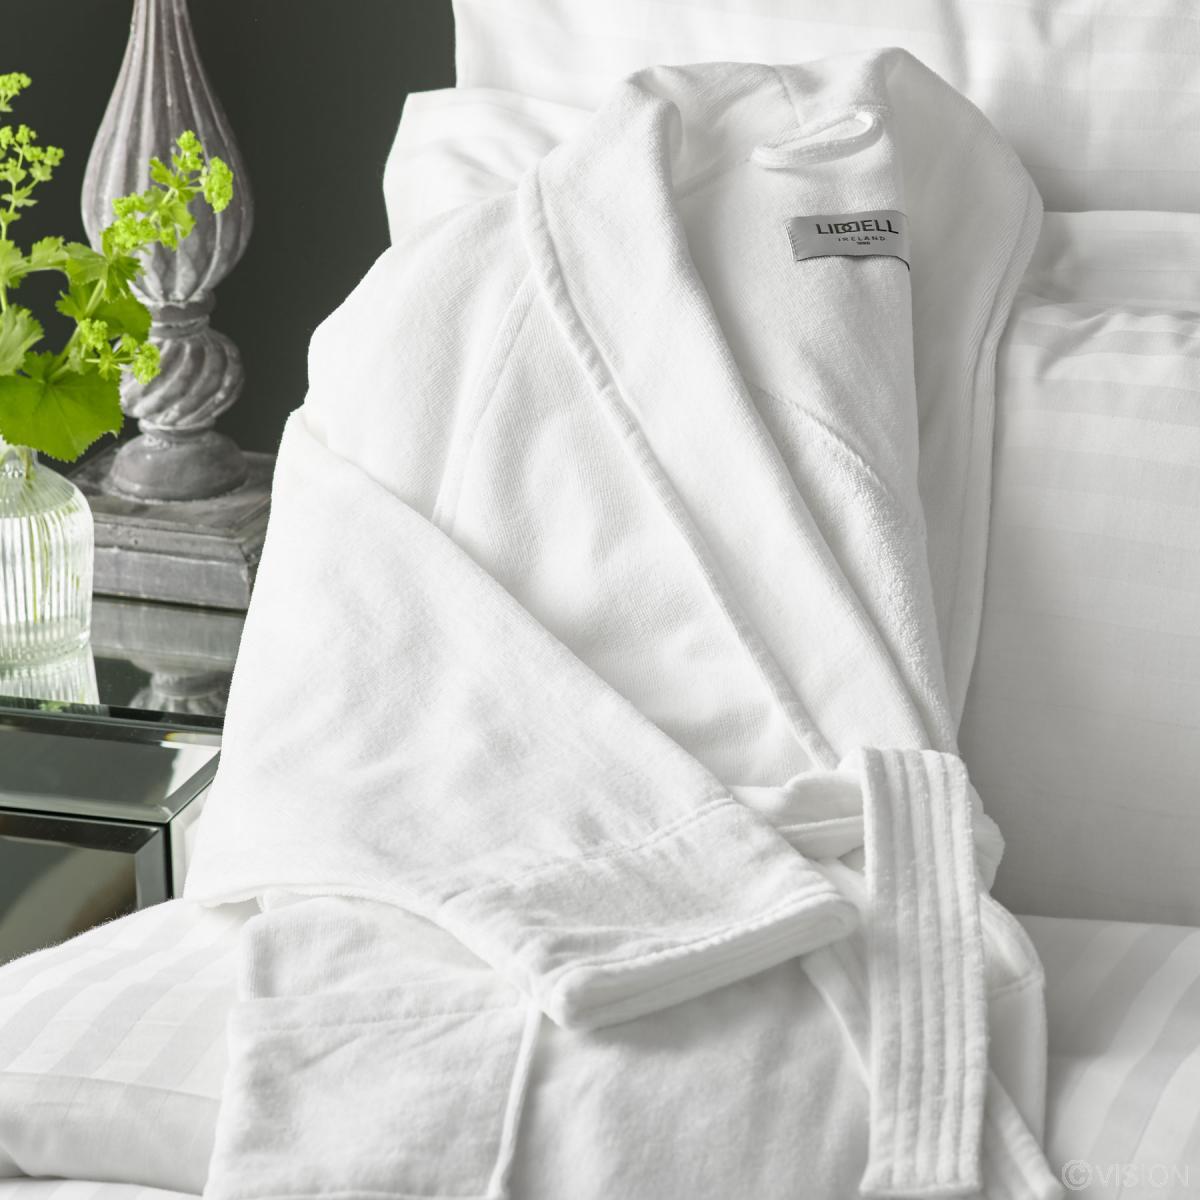 ca25aae996 Vermont white luxury bathrobe draped on bed